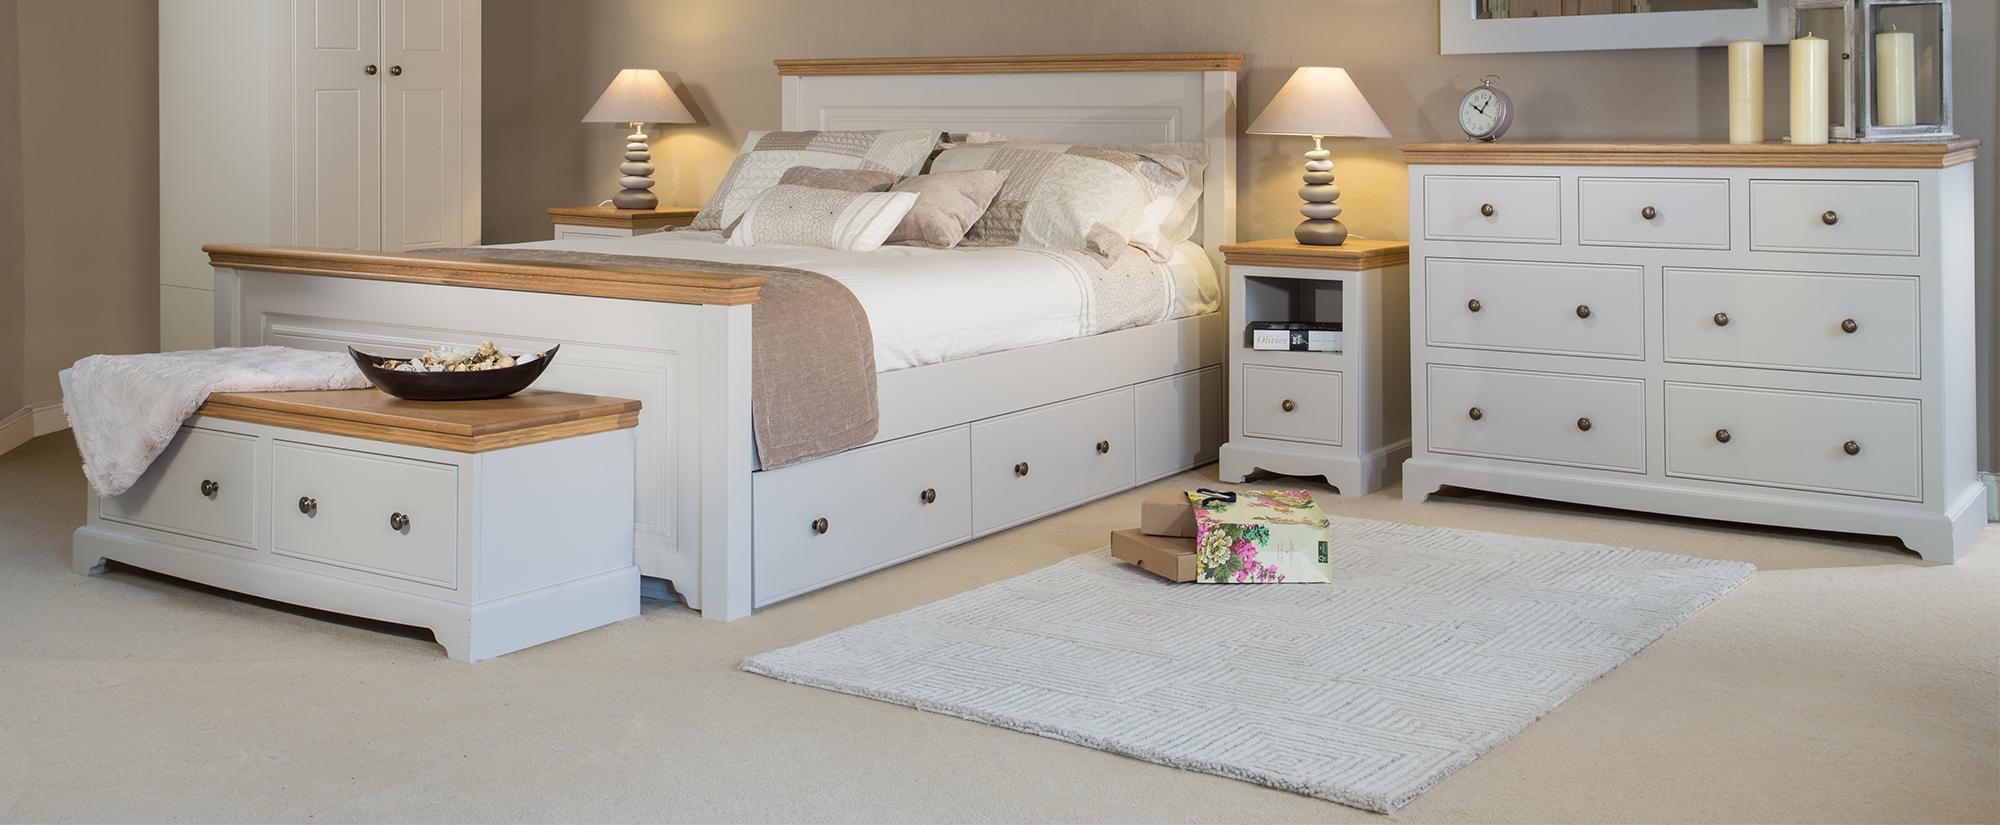 Oxford Painted Bedroom Furniture   Painted Bedroom Furniture